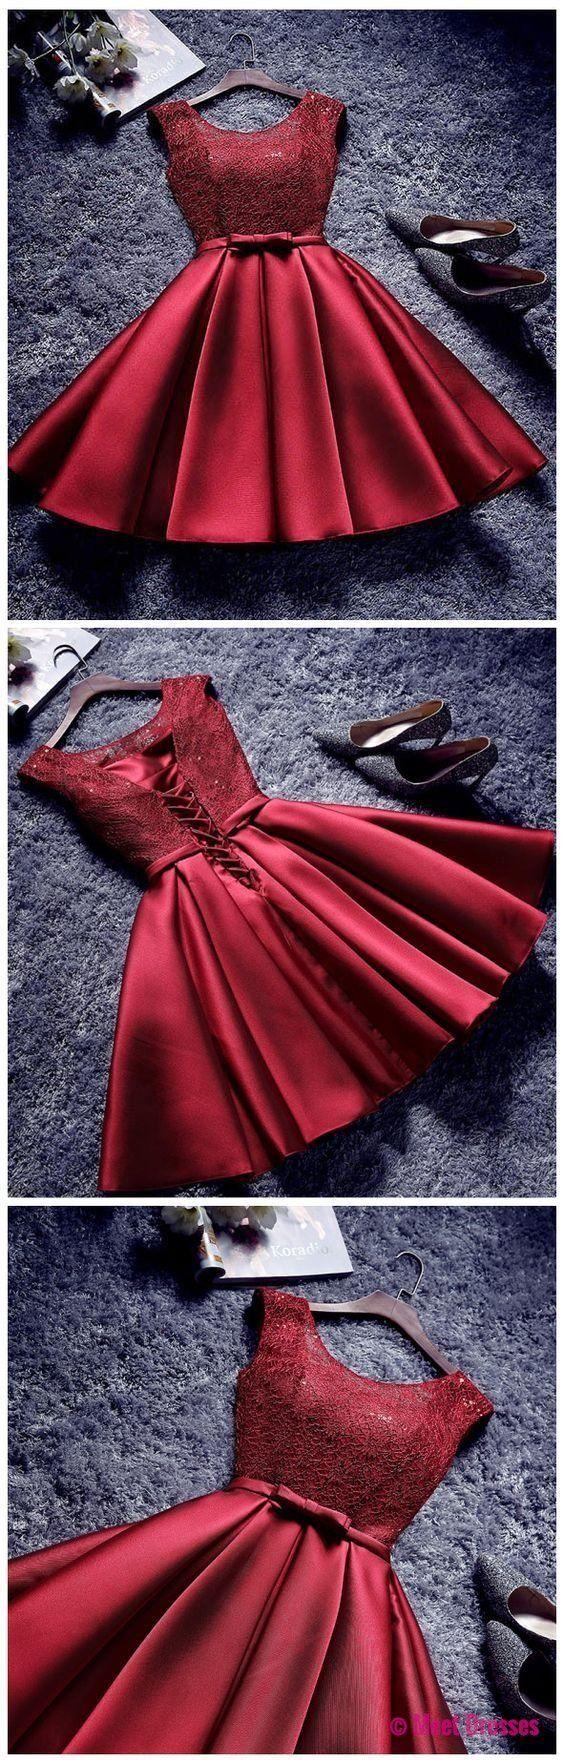 short prom dress,satin cocktail dress,homecoming dress,semi formal dress,graduation dresses PD20188331 #HomecomingDress